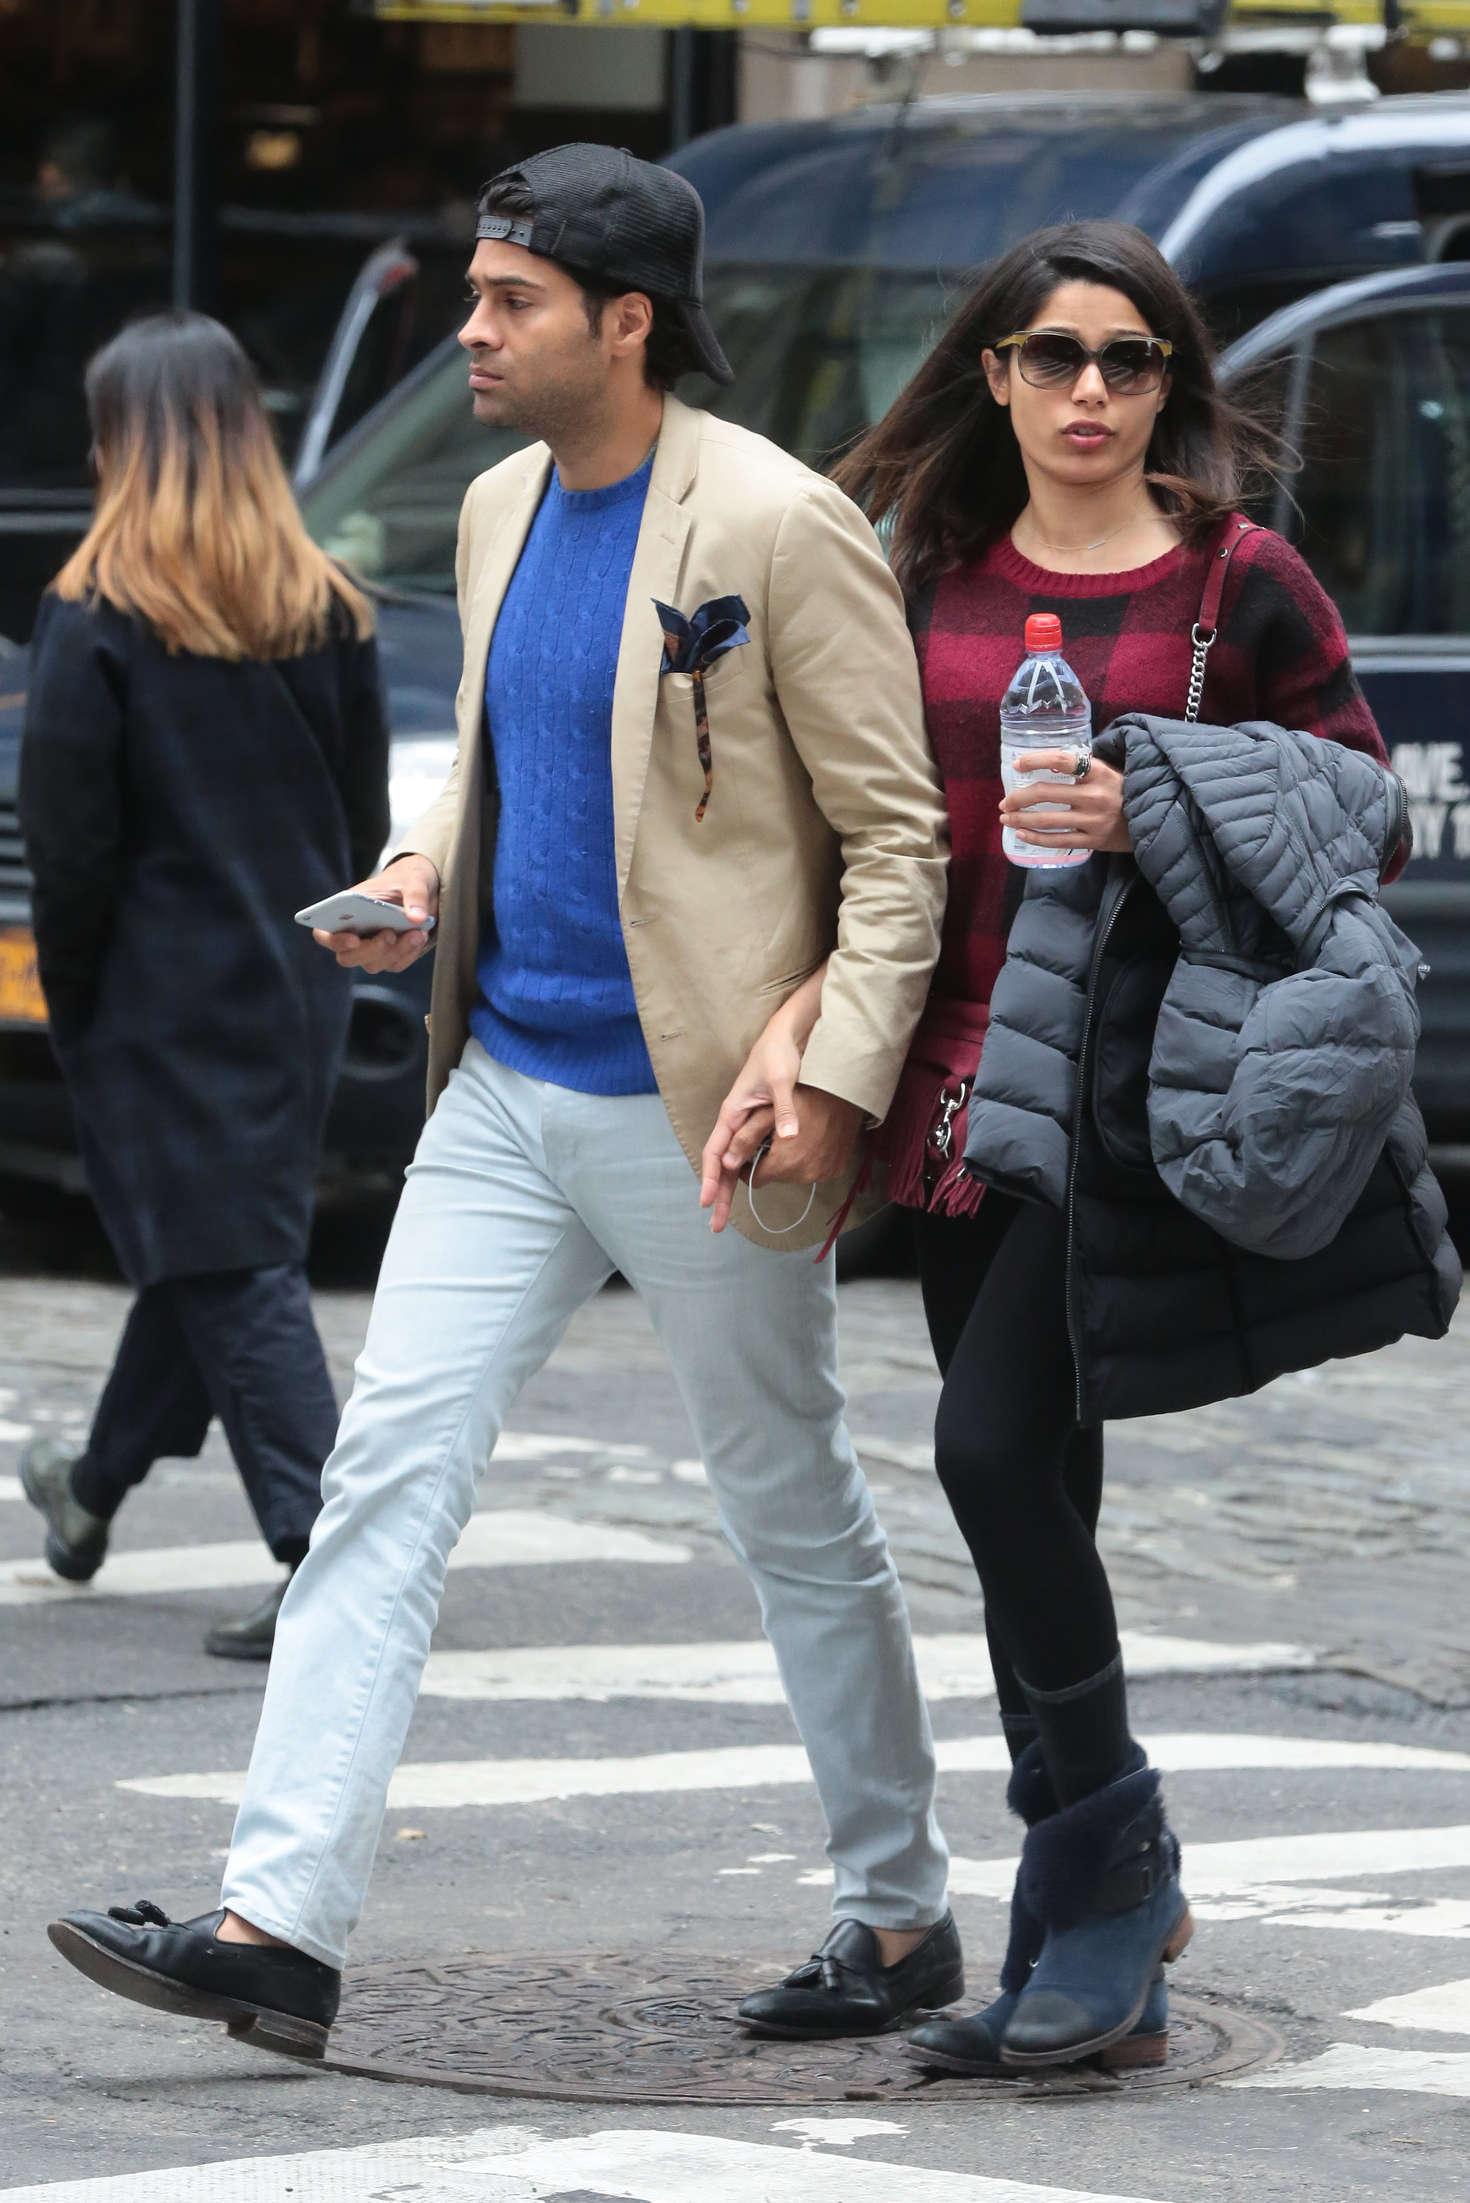 Freida Pinto and her boyfriend out in New York -04 – GotCeleb